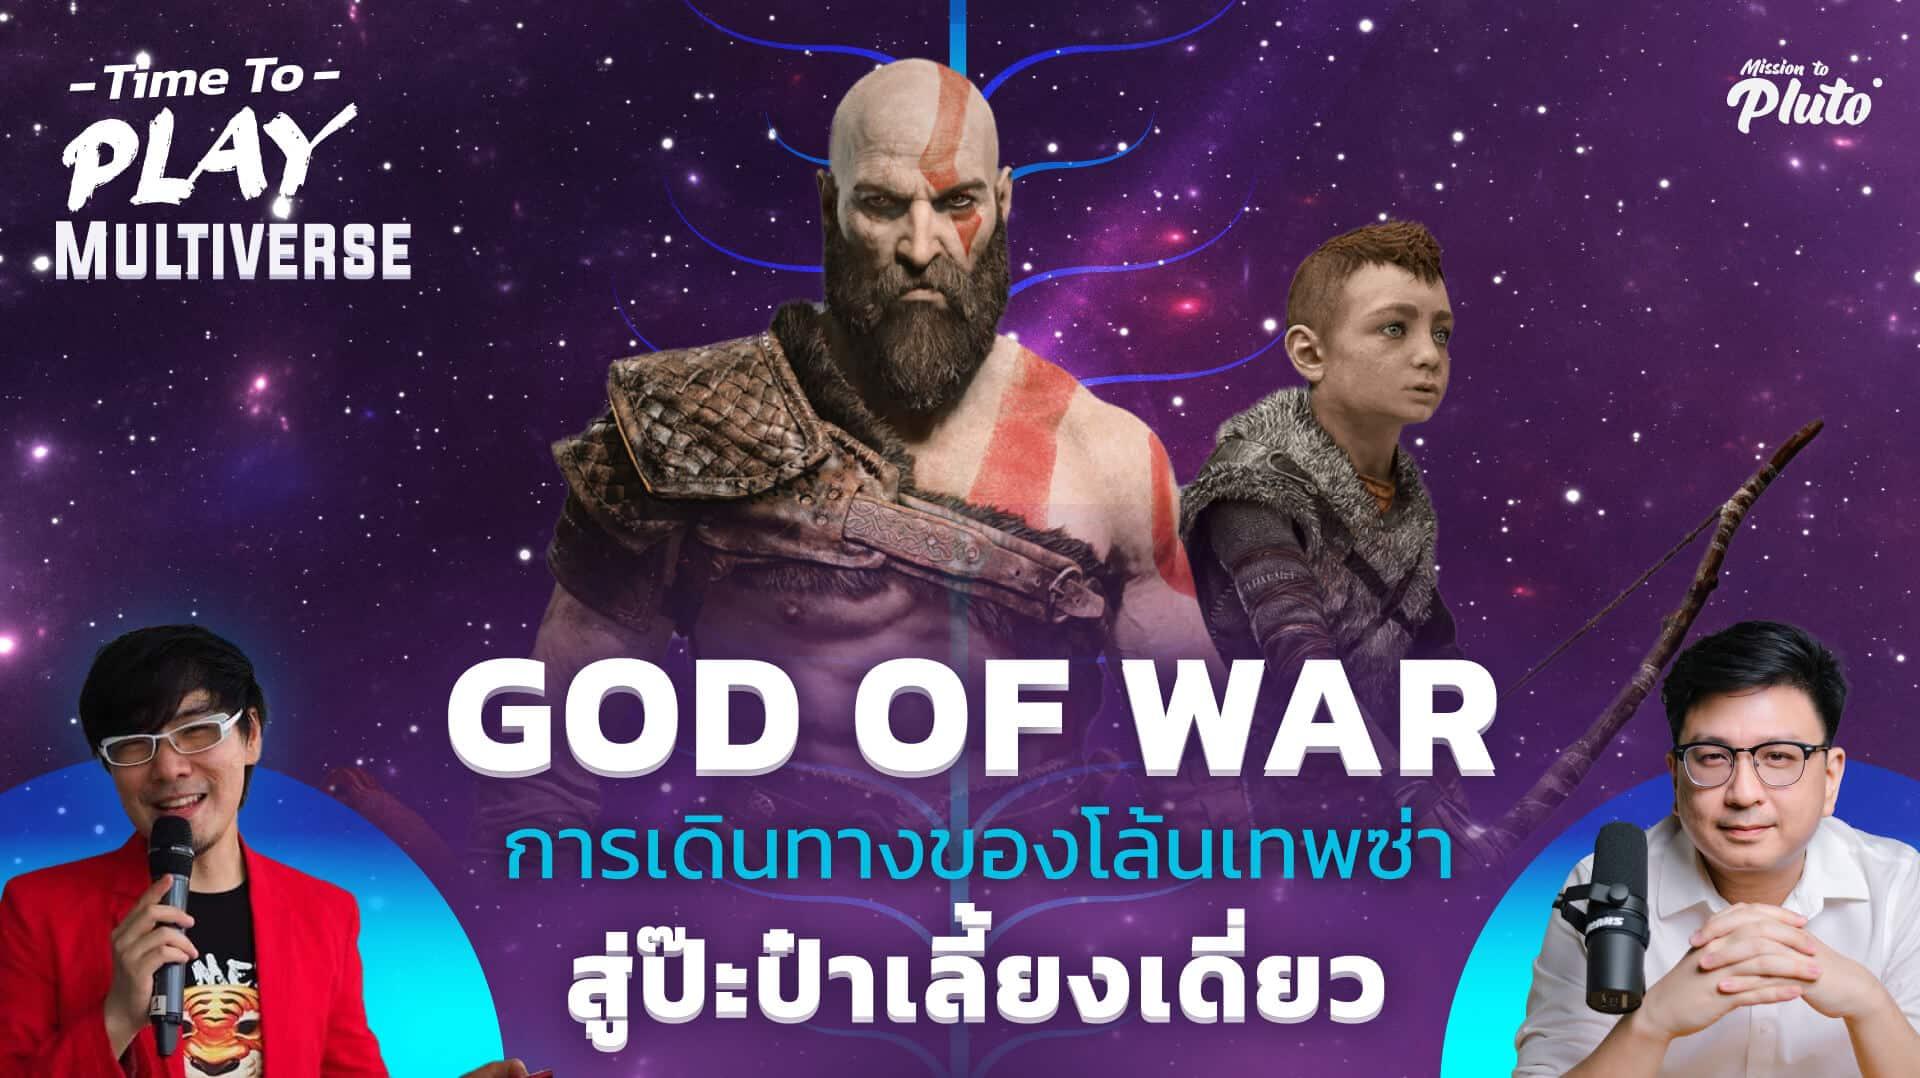 God of War การเดินทางของโล้นเทพซ่า สู่ป๊ะป๋าเลี้ยงเดี่ยว   Time to Play EP.52 Multiverse